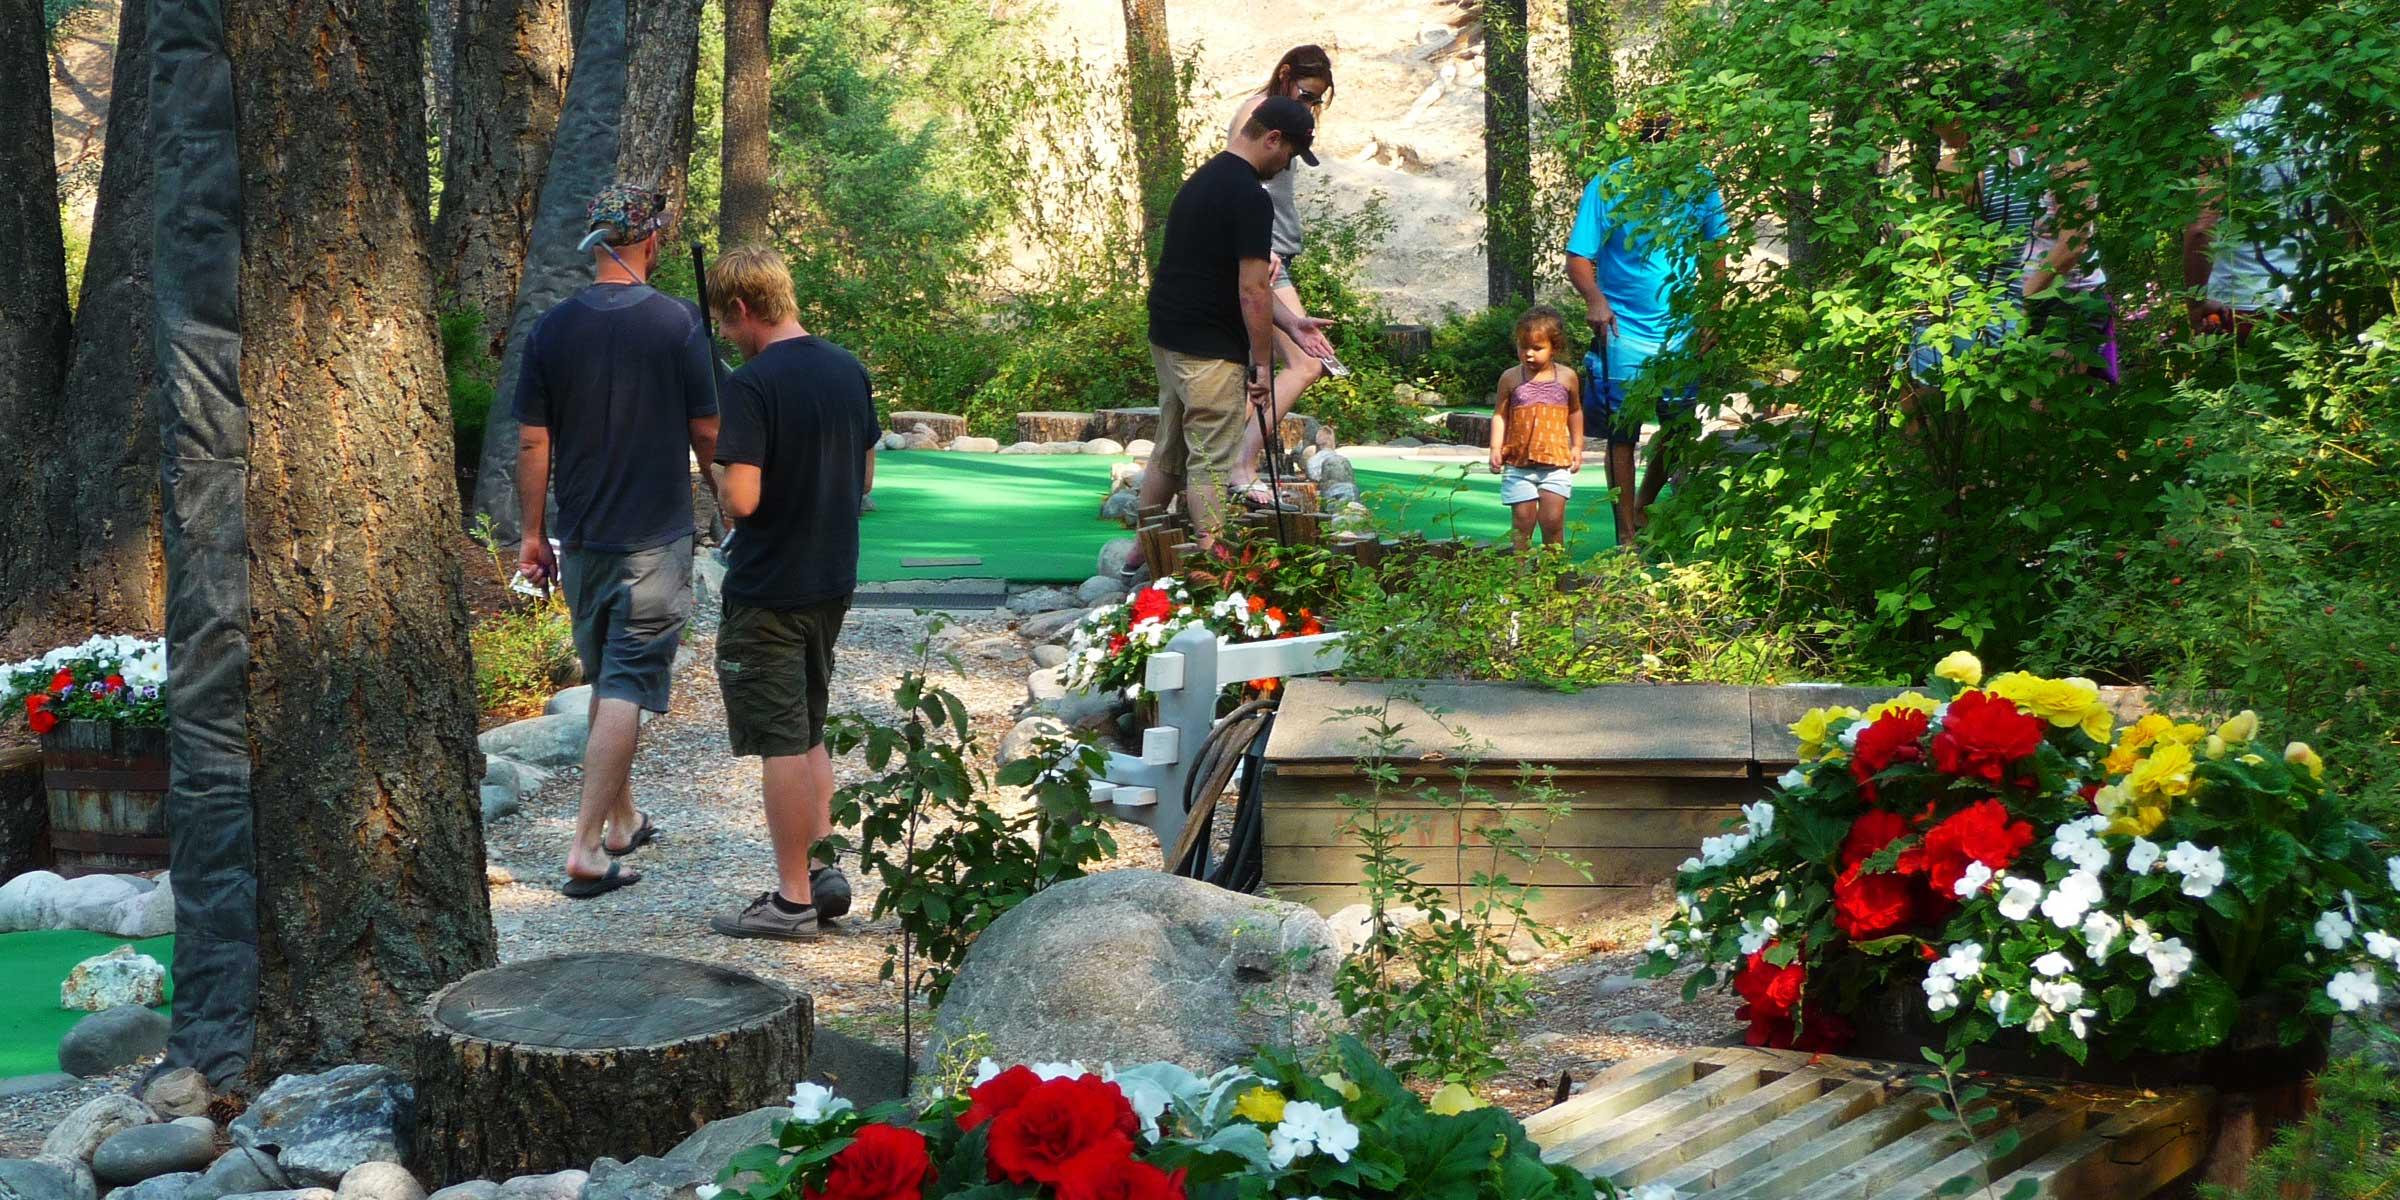 Fairmont Hot Springs - mini golf